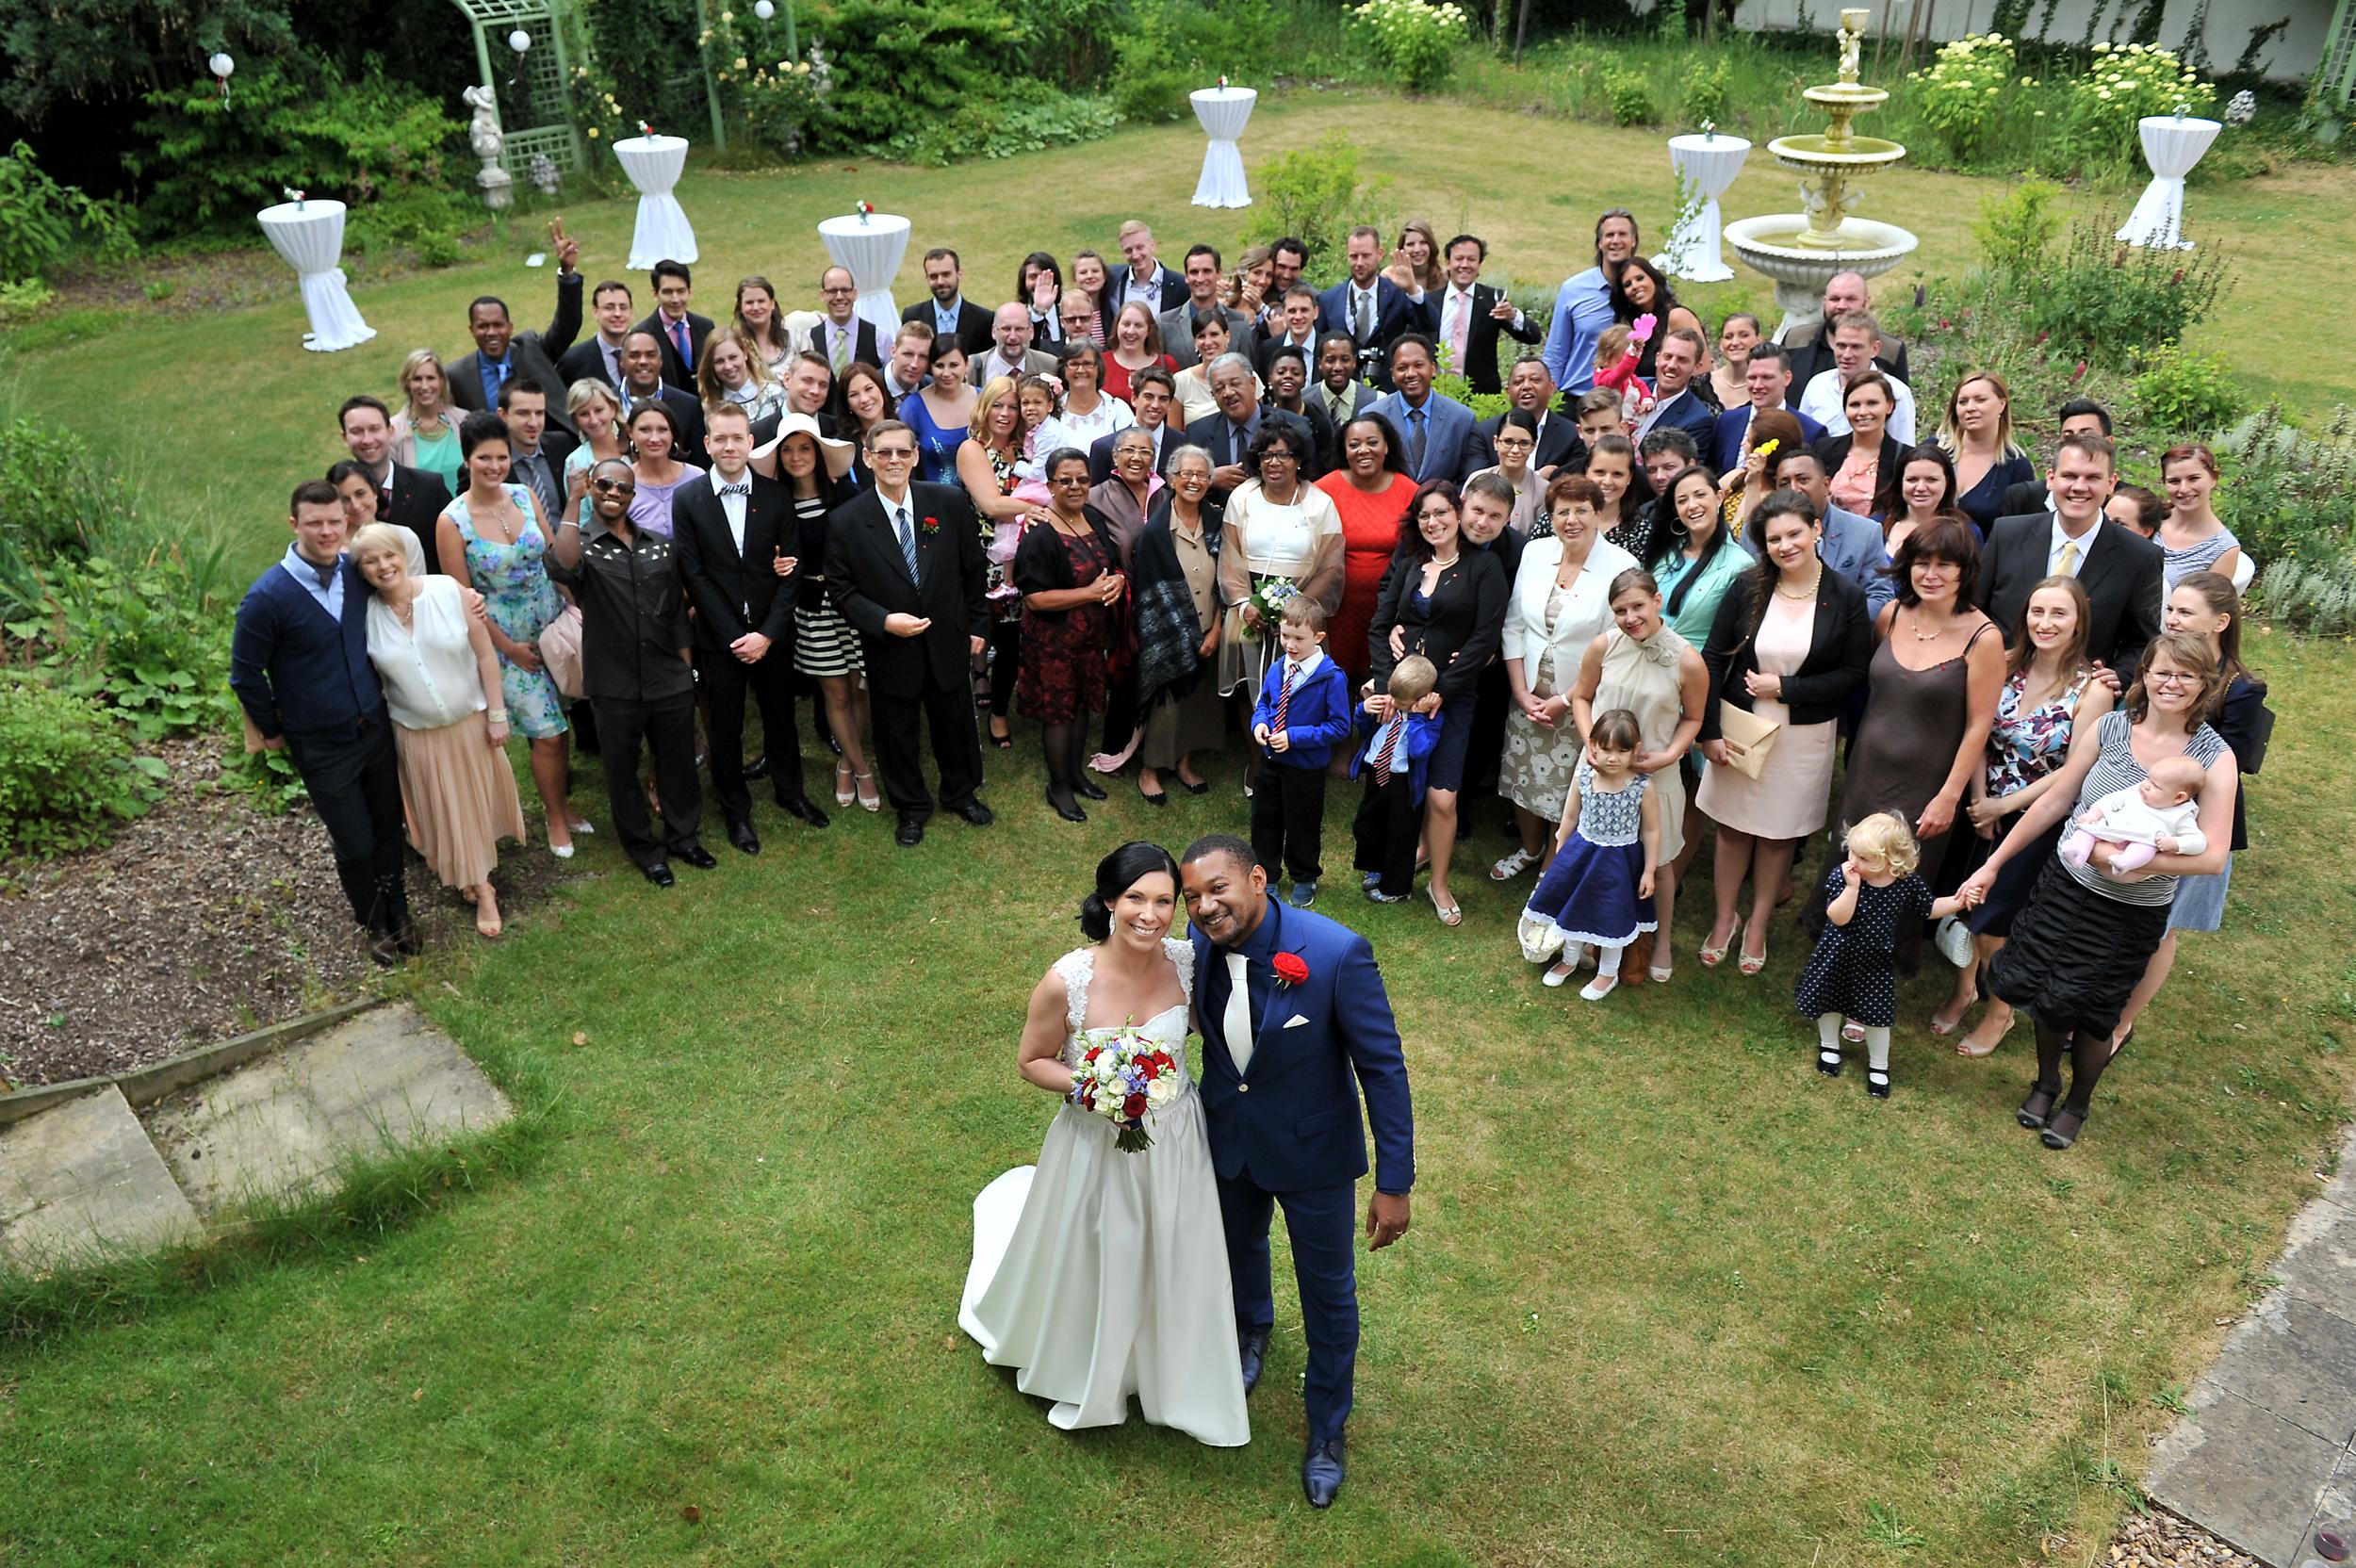 svatba stylove 3.JPG